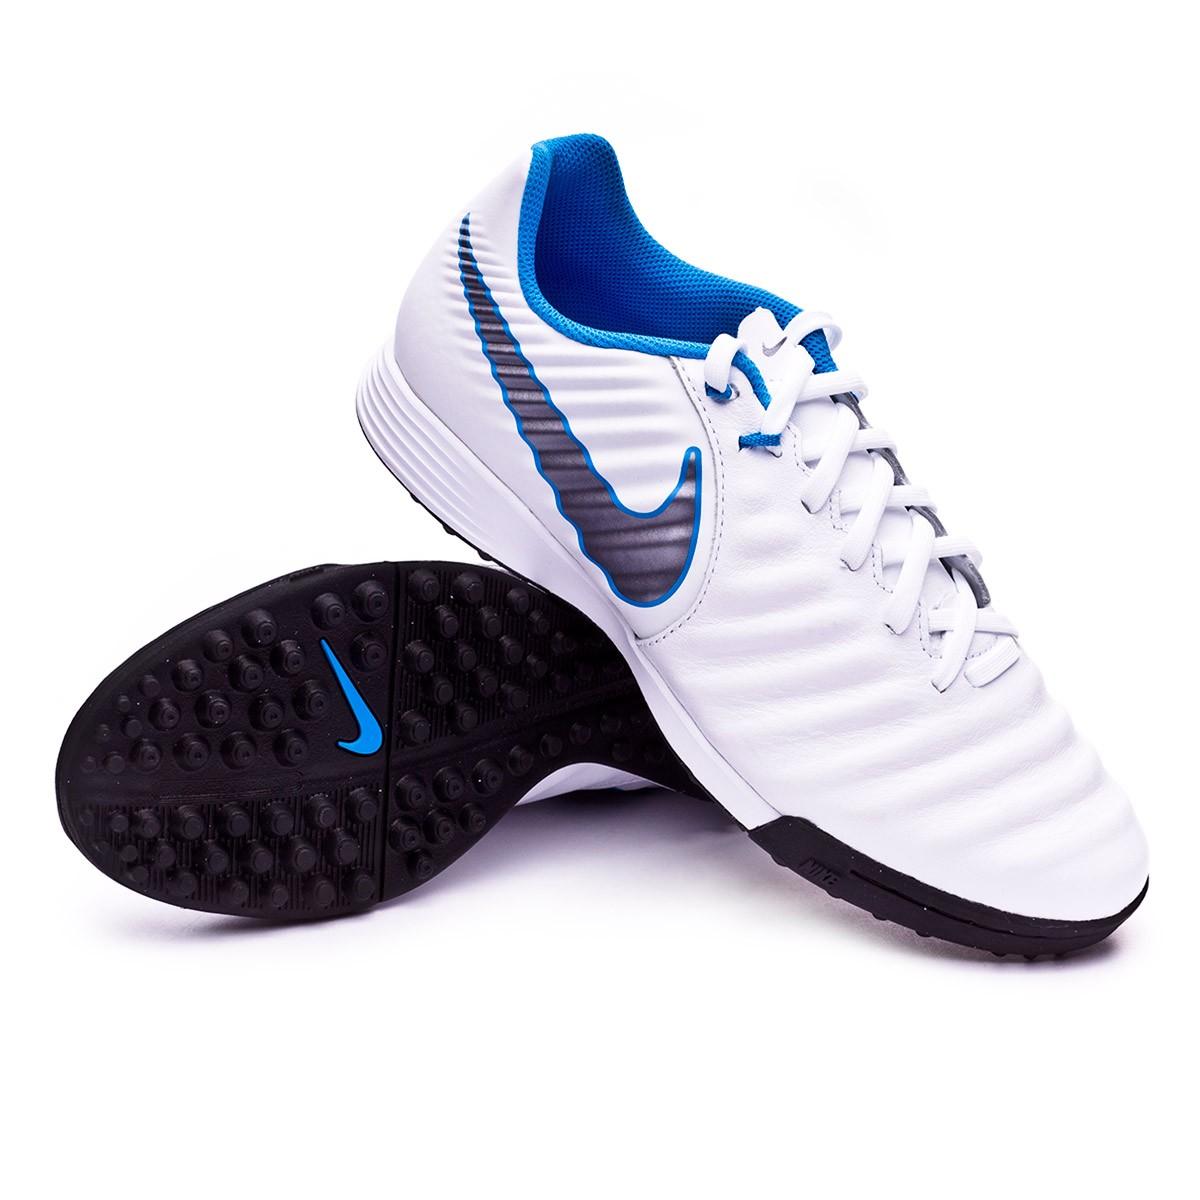 9c93d5b8d Football Boot Nike Tiempo LegendX VII Academy Turf White-Metallic ...